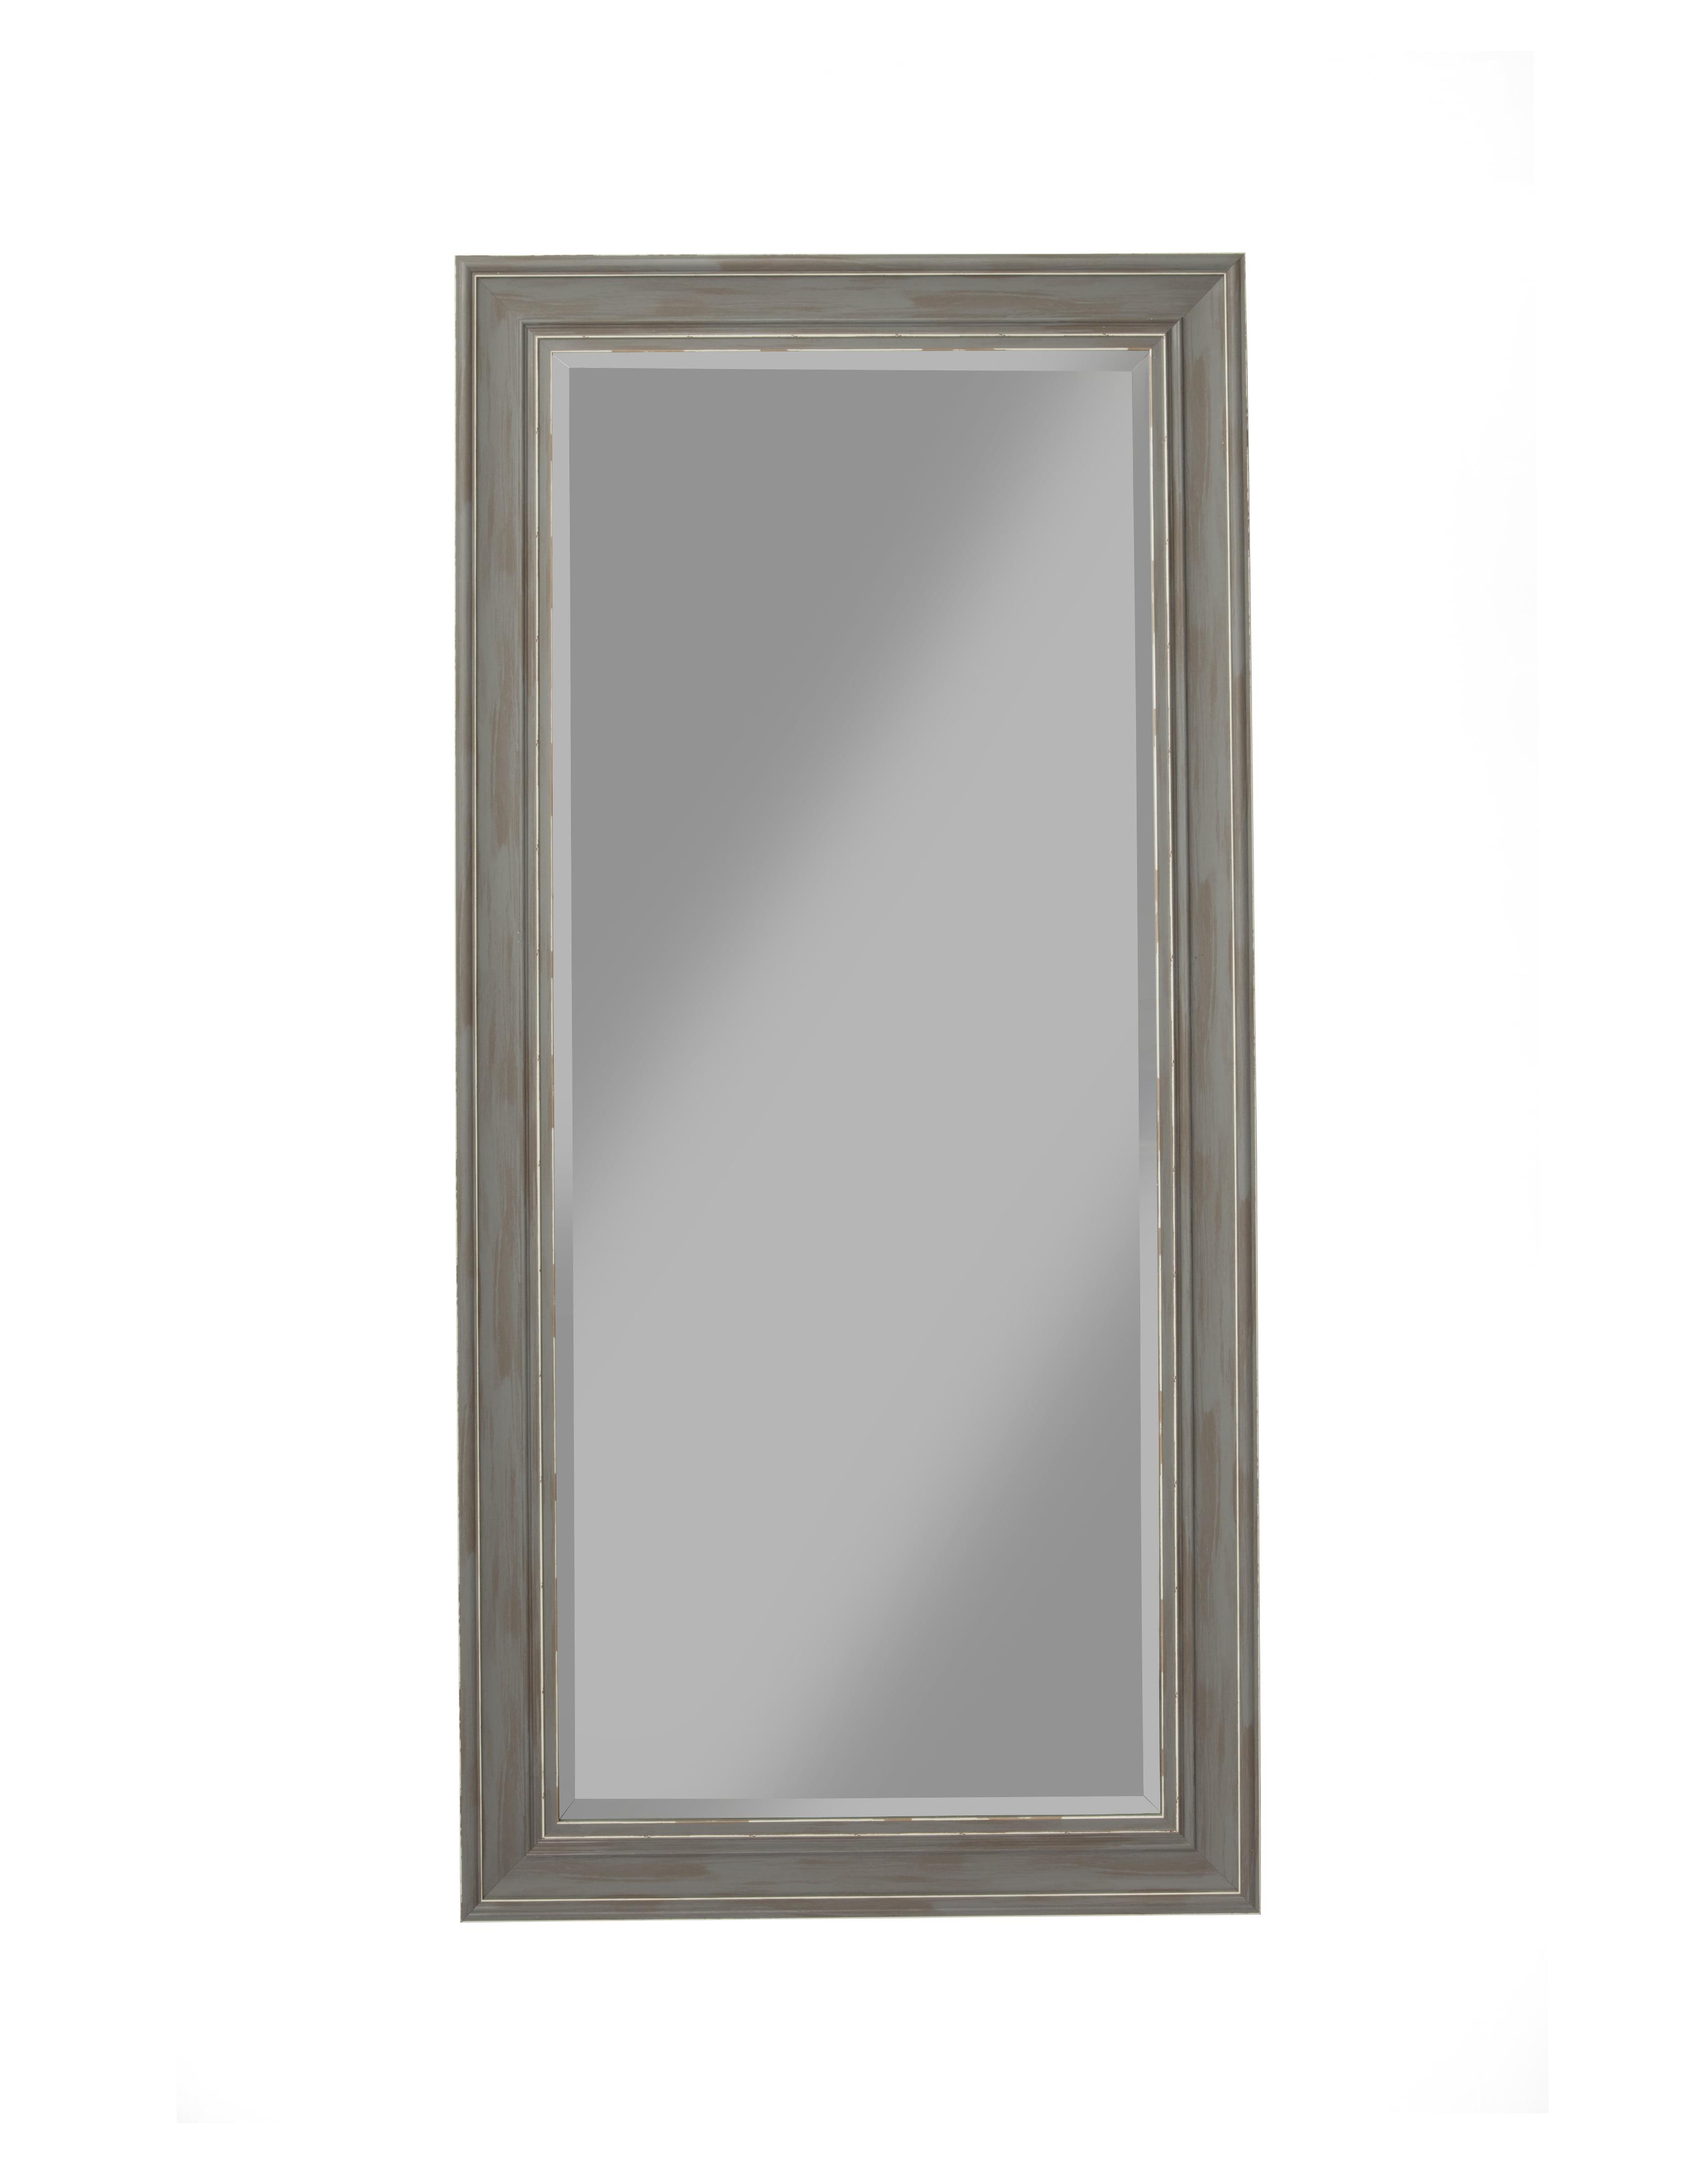 Antique Grey Farmhouse Full Length Leaner Mirror by Martin Svensson Home